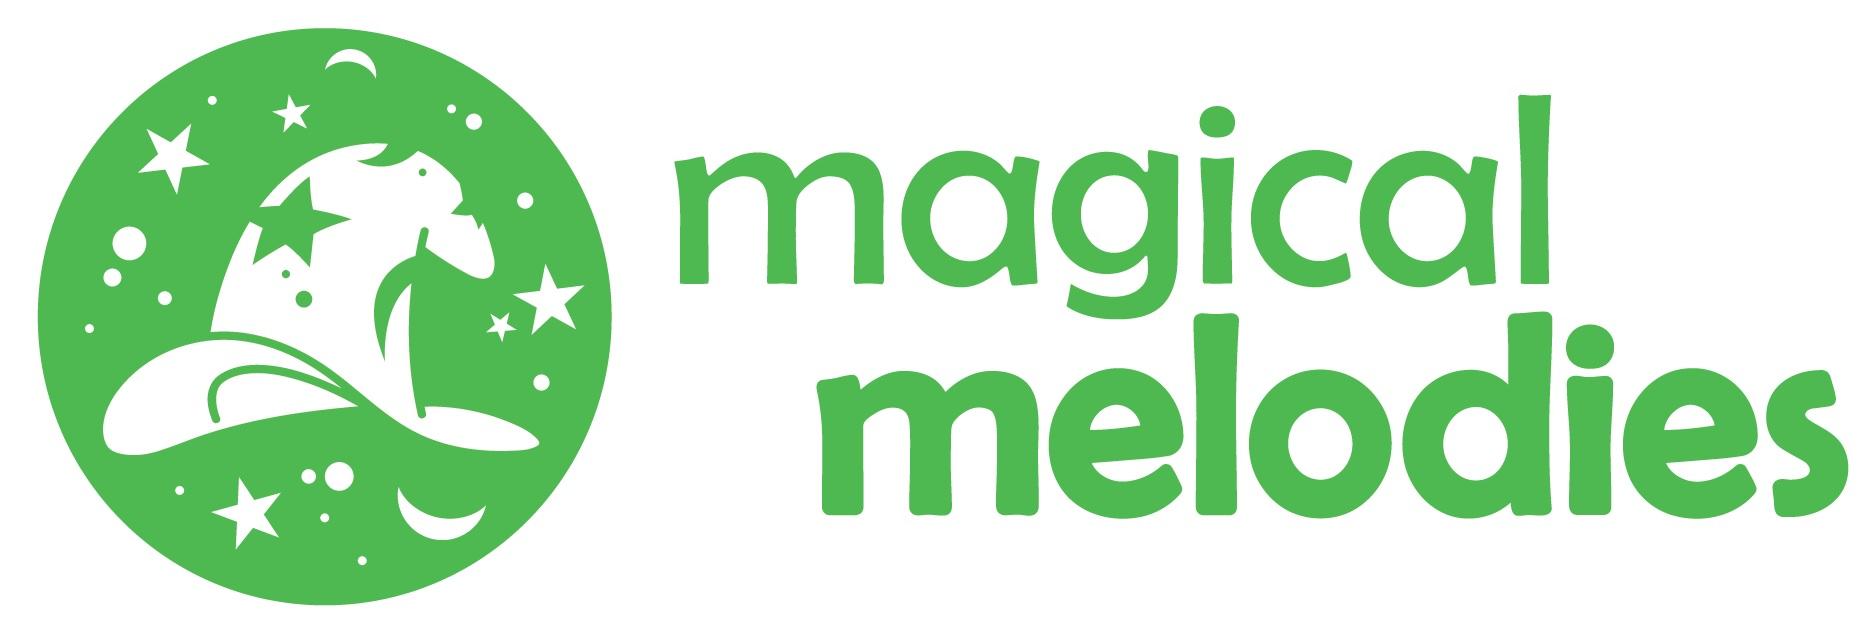 magicmeoldies logo.jpg